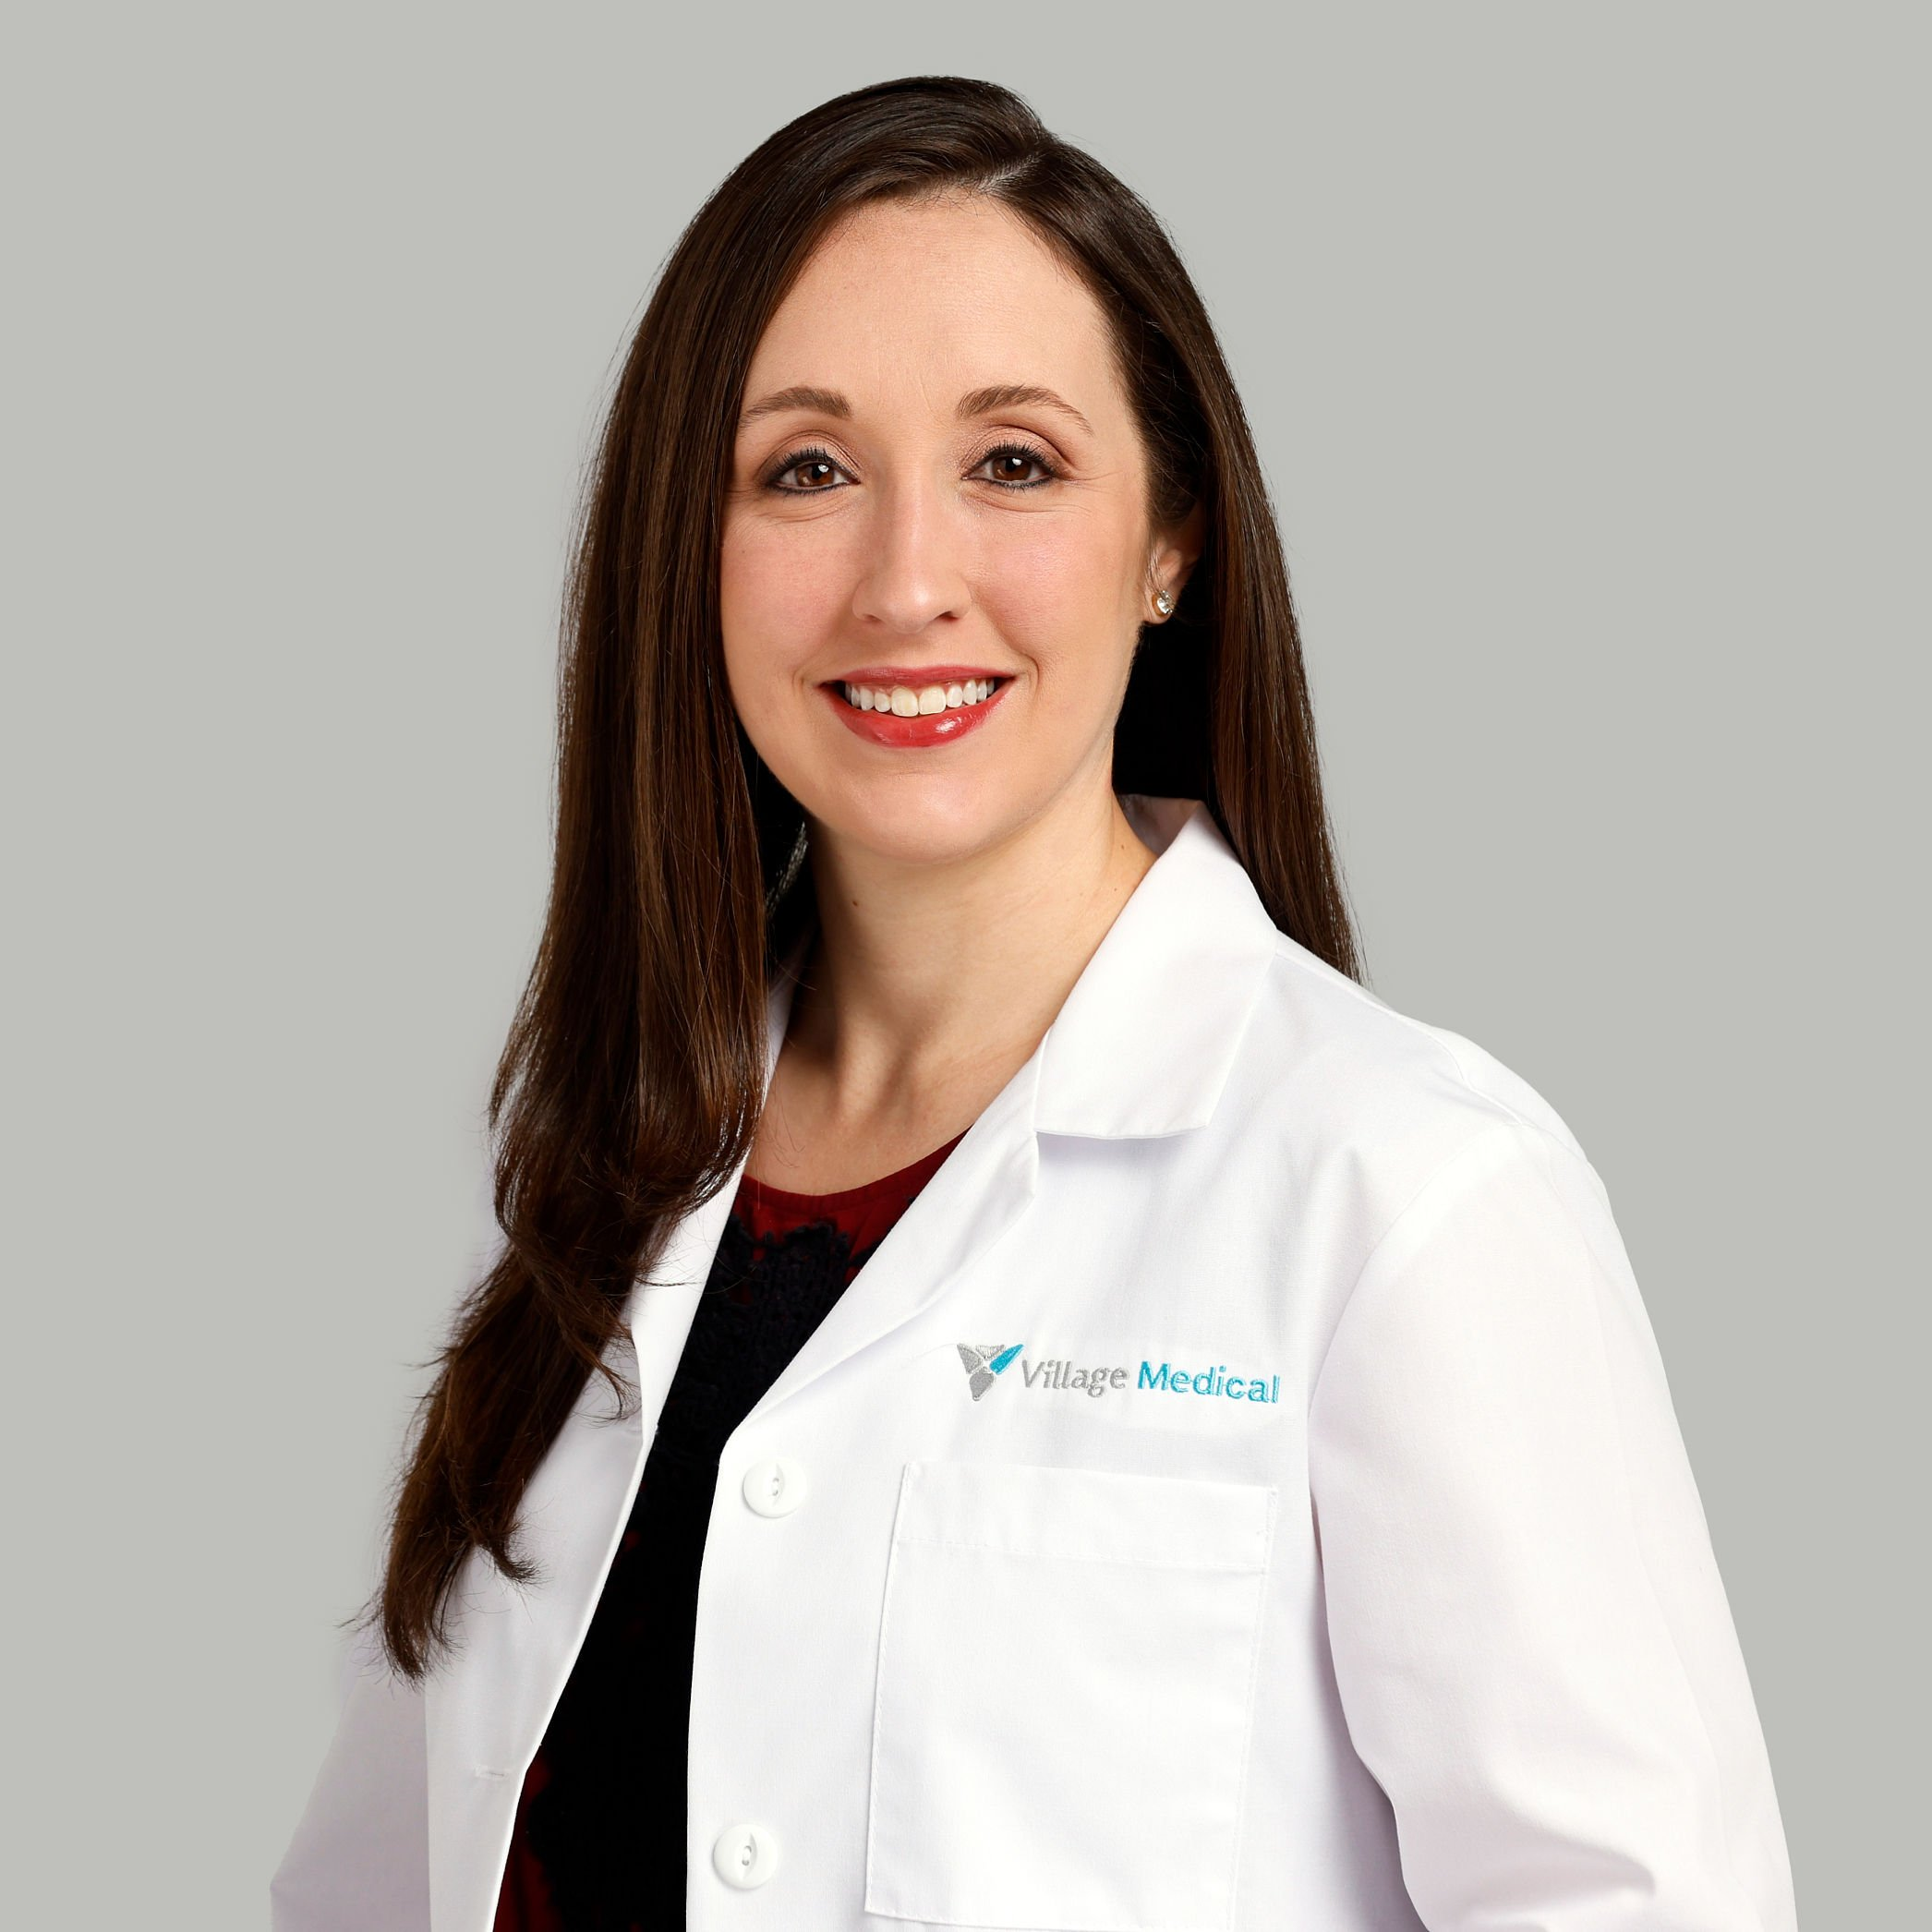 Jennifer Dorchuck, PA-C